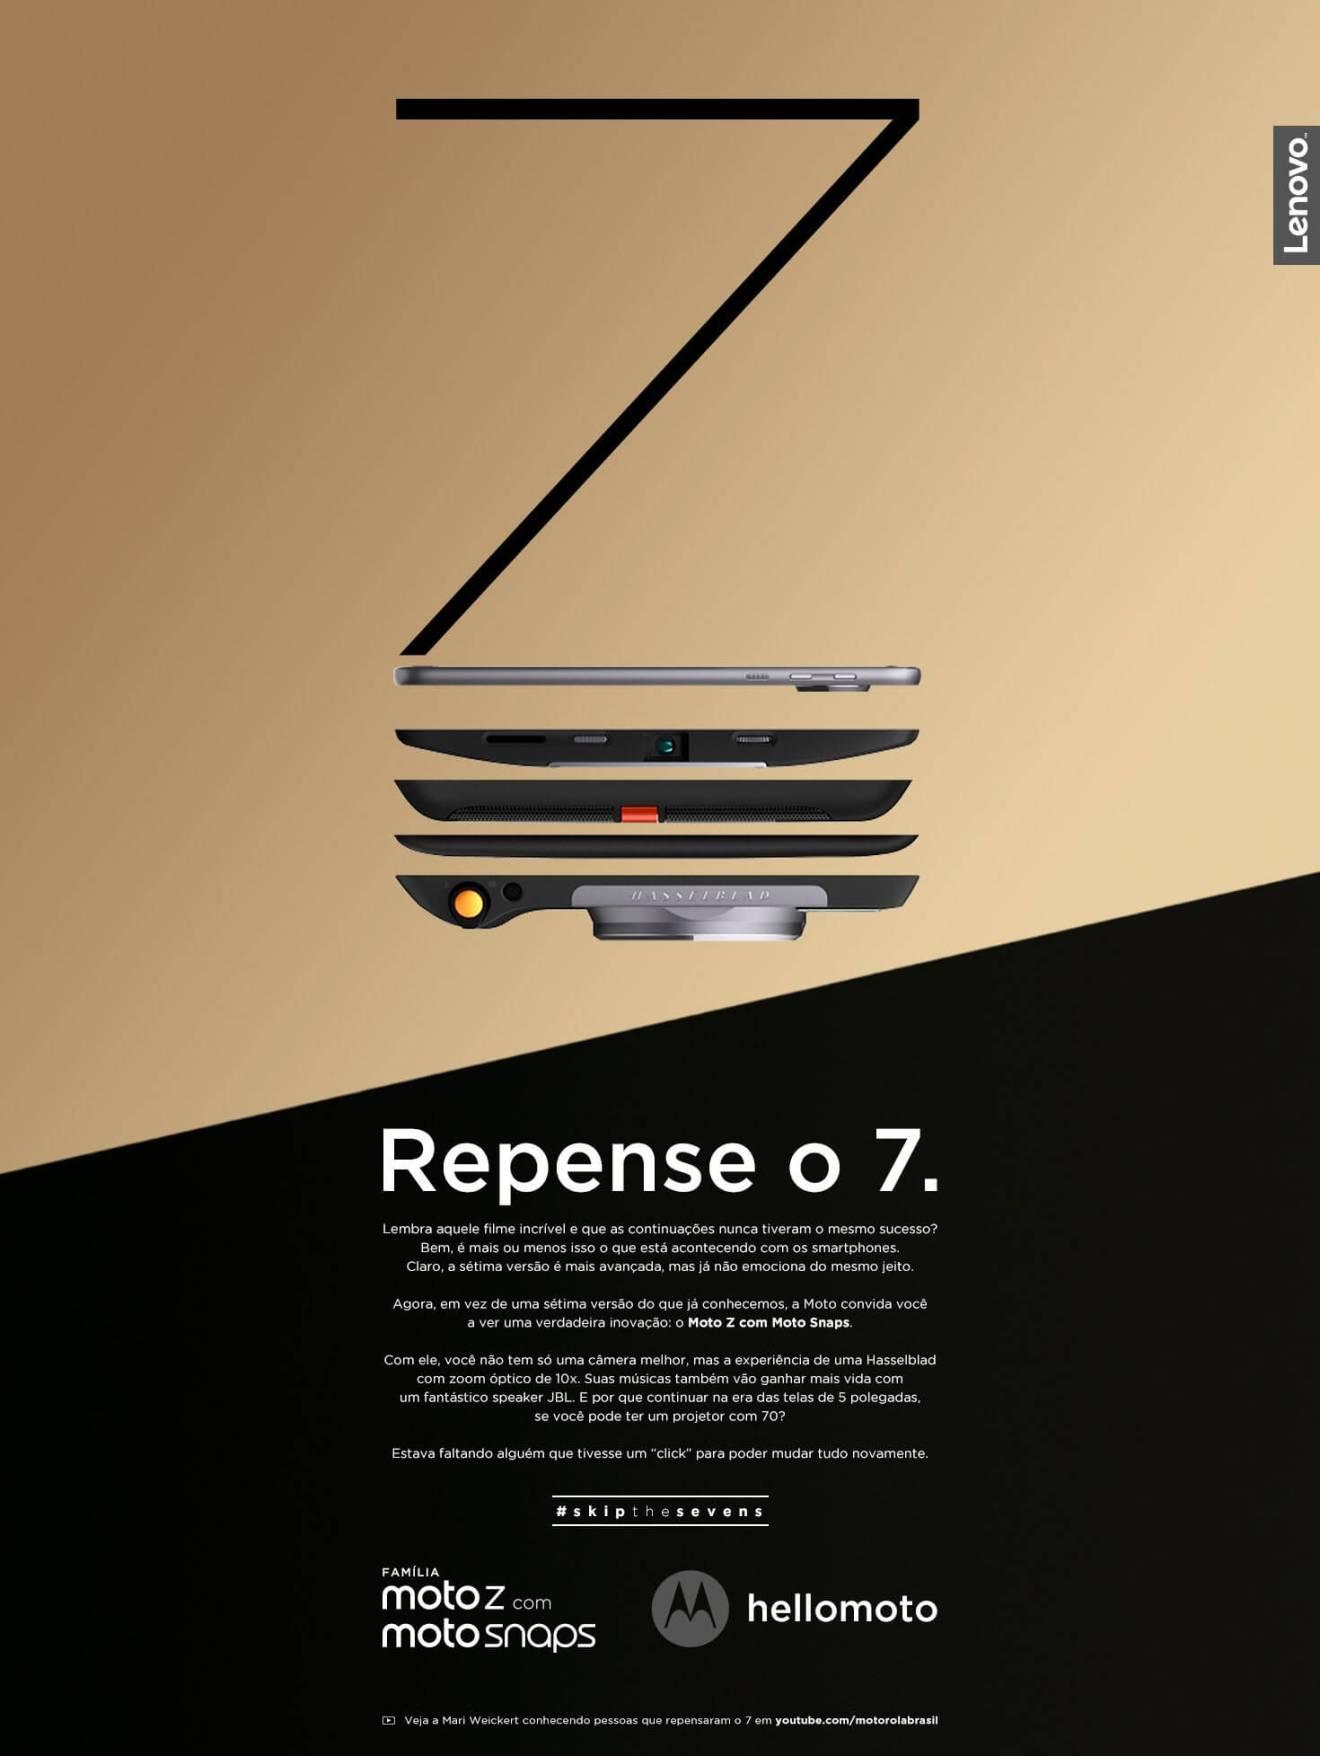 unnamed 1 - Motorola alfineta Galaxies e iPhones em nova campanha do Moto Z